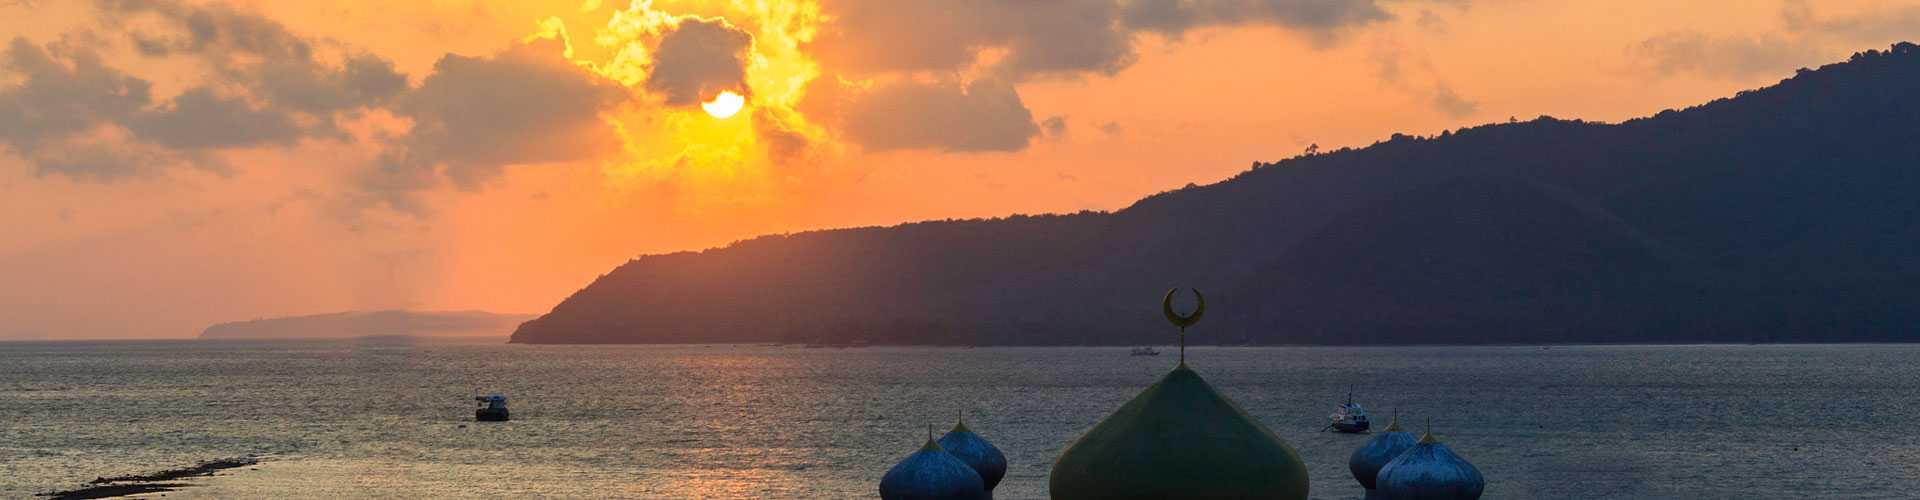 phuket attraction